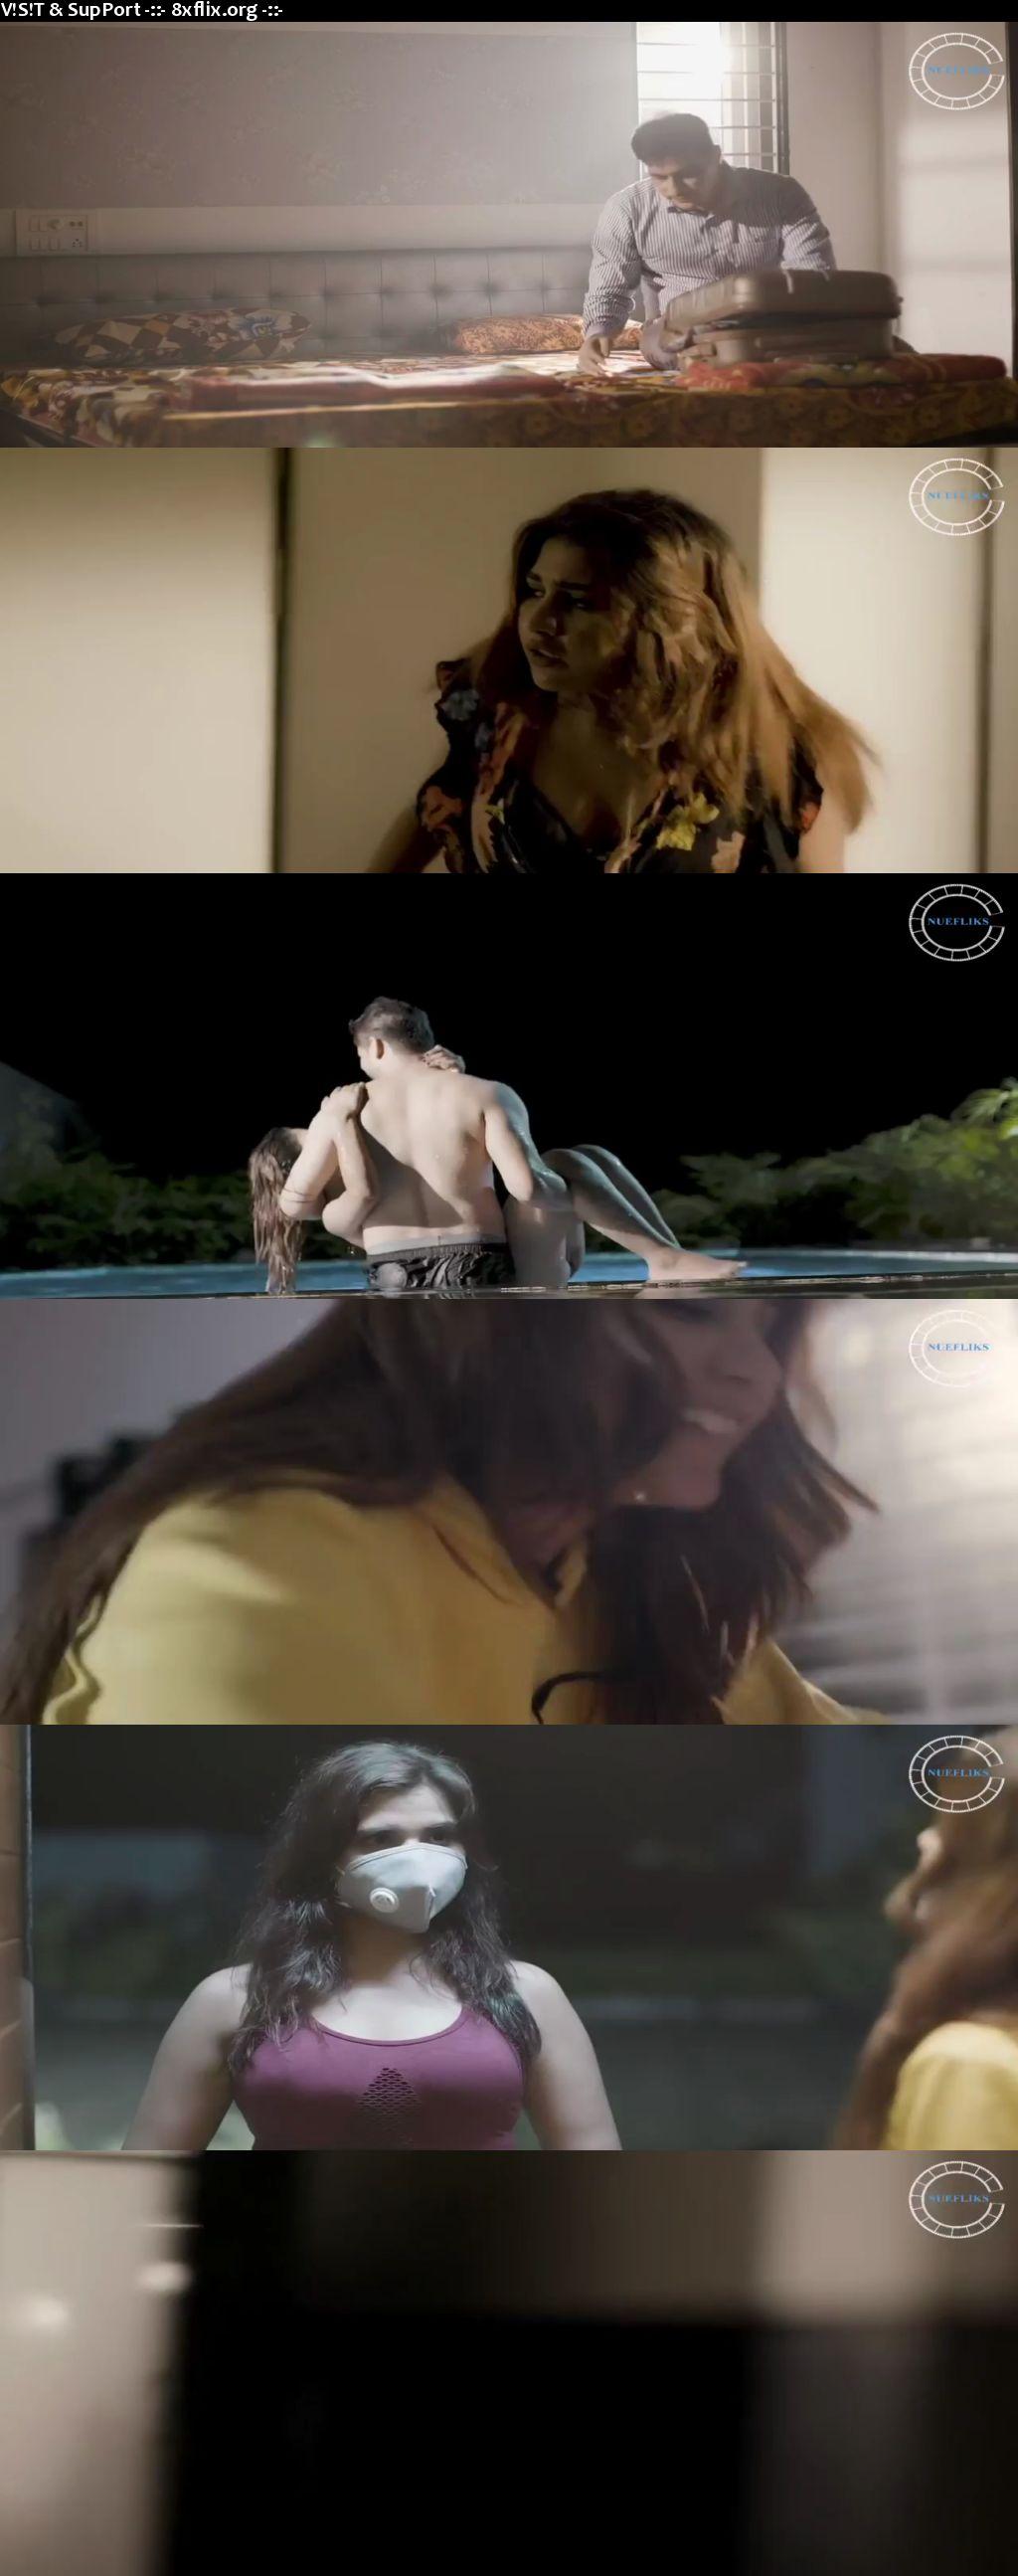 18+ Intercourse Reloaded 2020 Full Hindi HOT Movie Download 720p HDRip